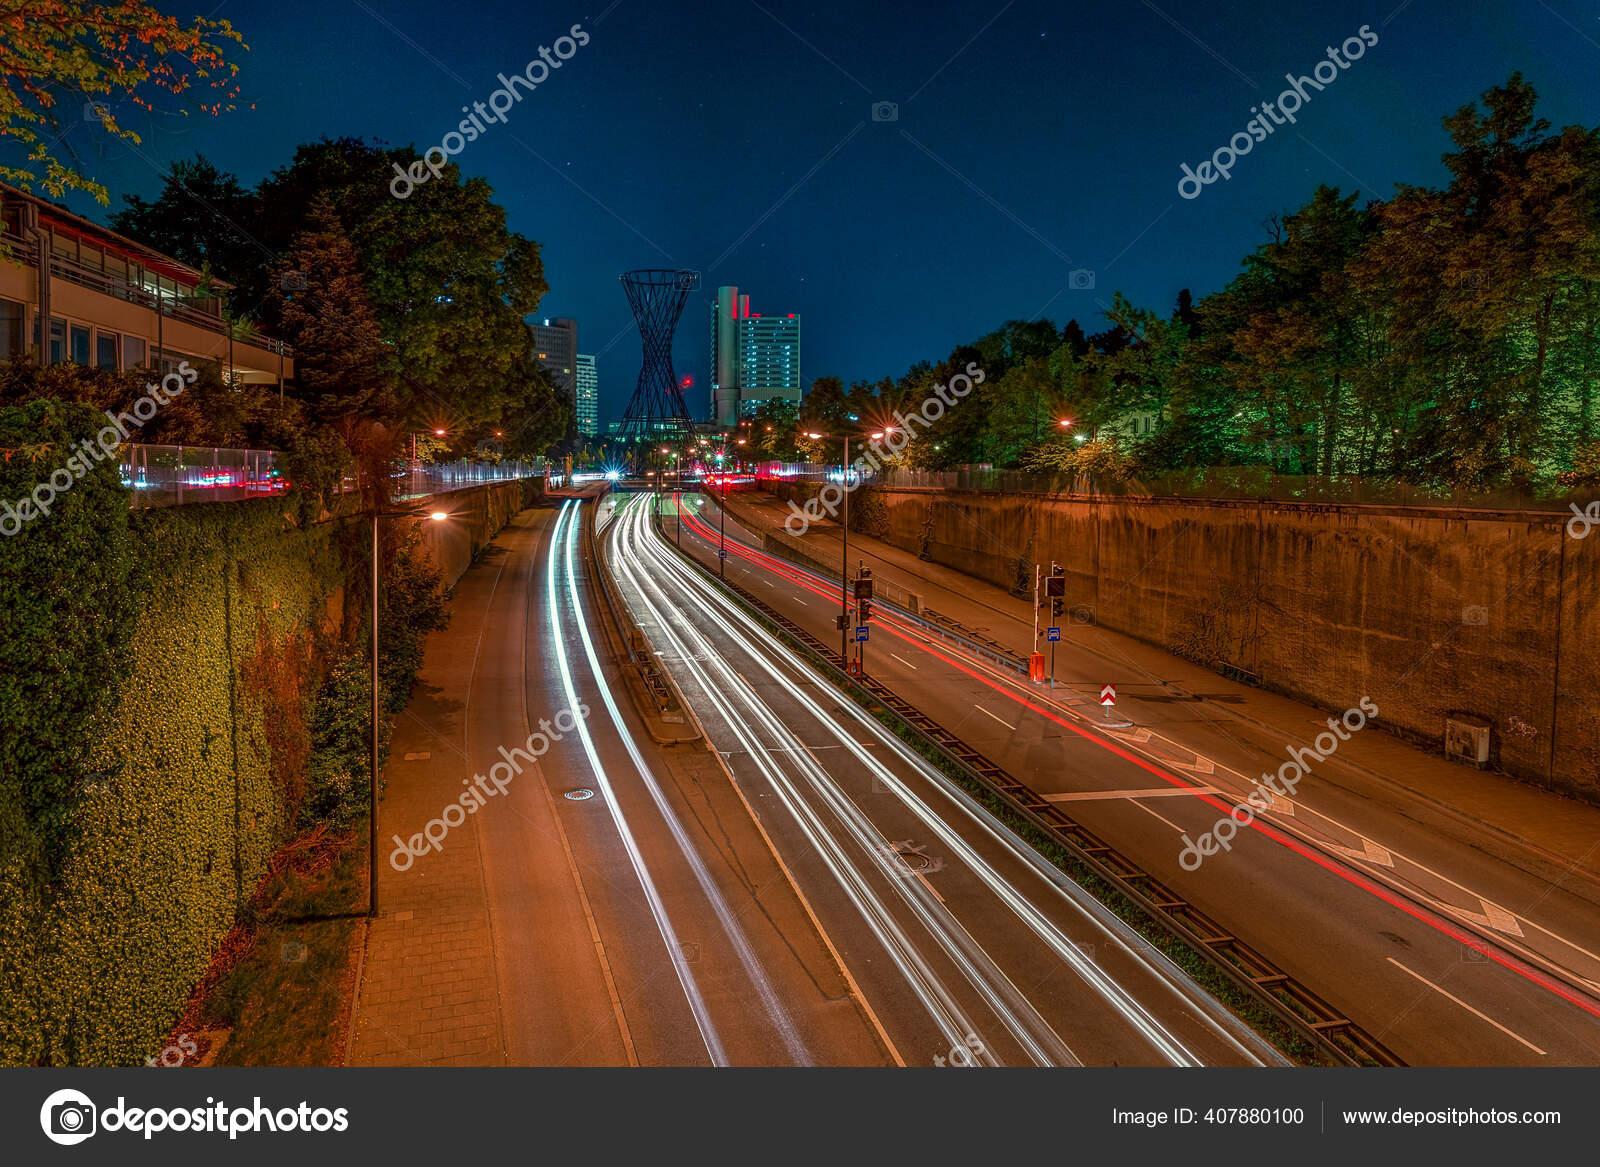 Munich Bavaria Night Popular German City Long Exposure Photography Light Stock Photo C Allessuper 407880100